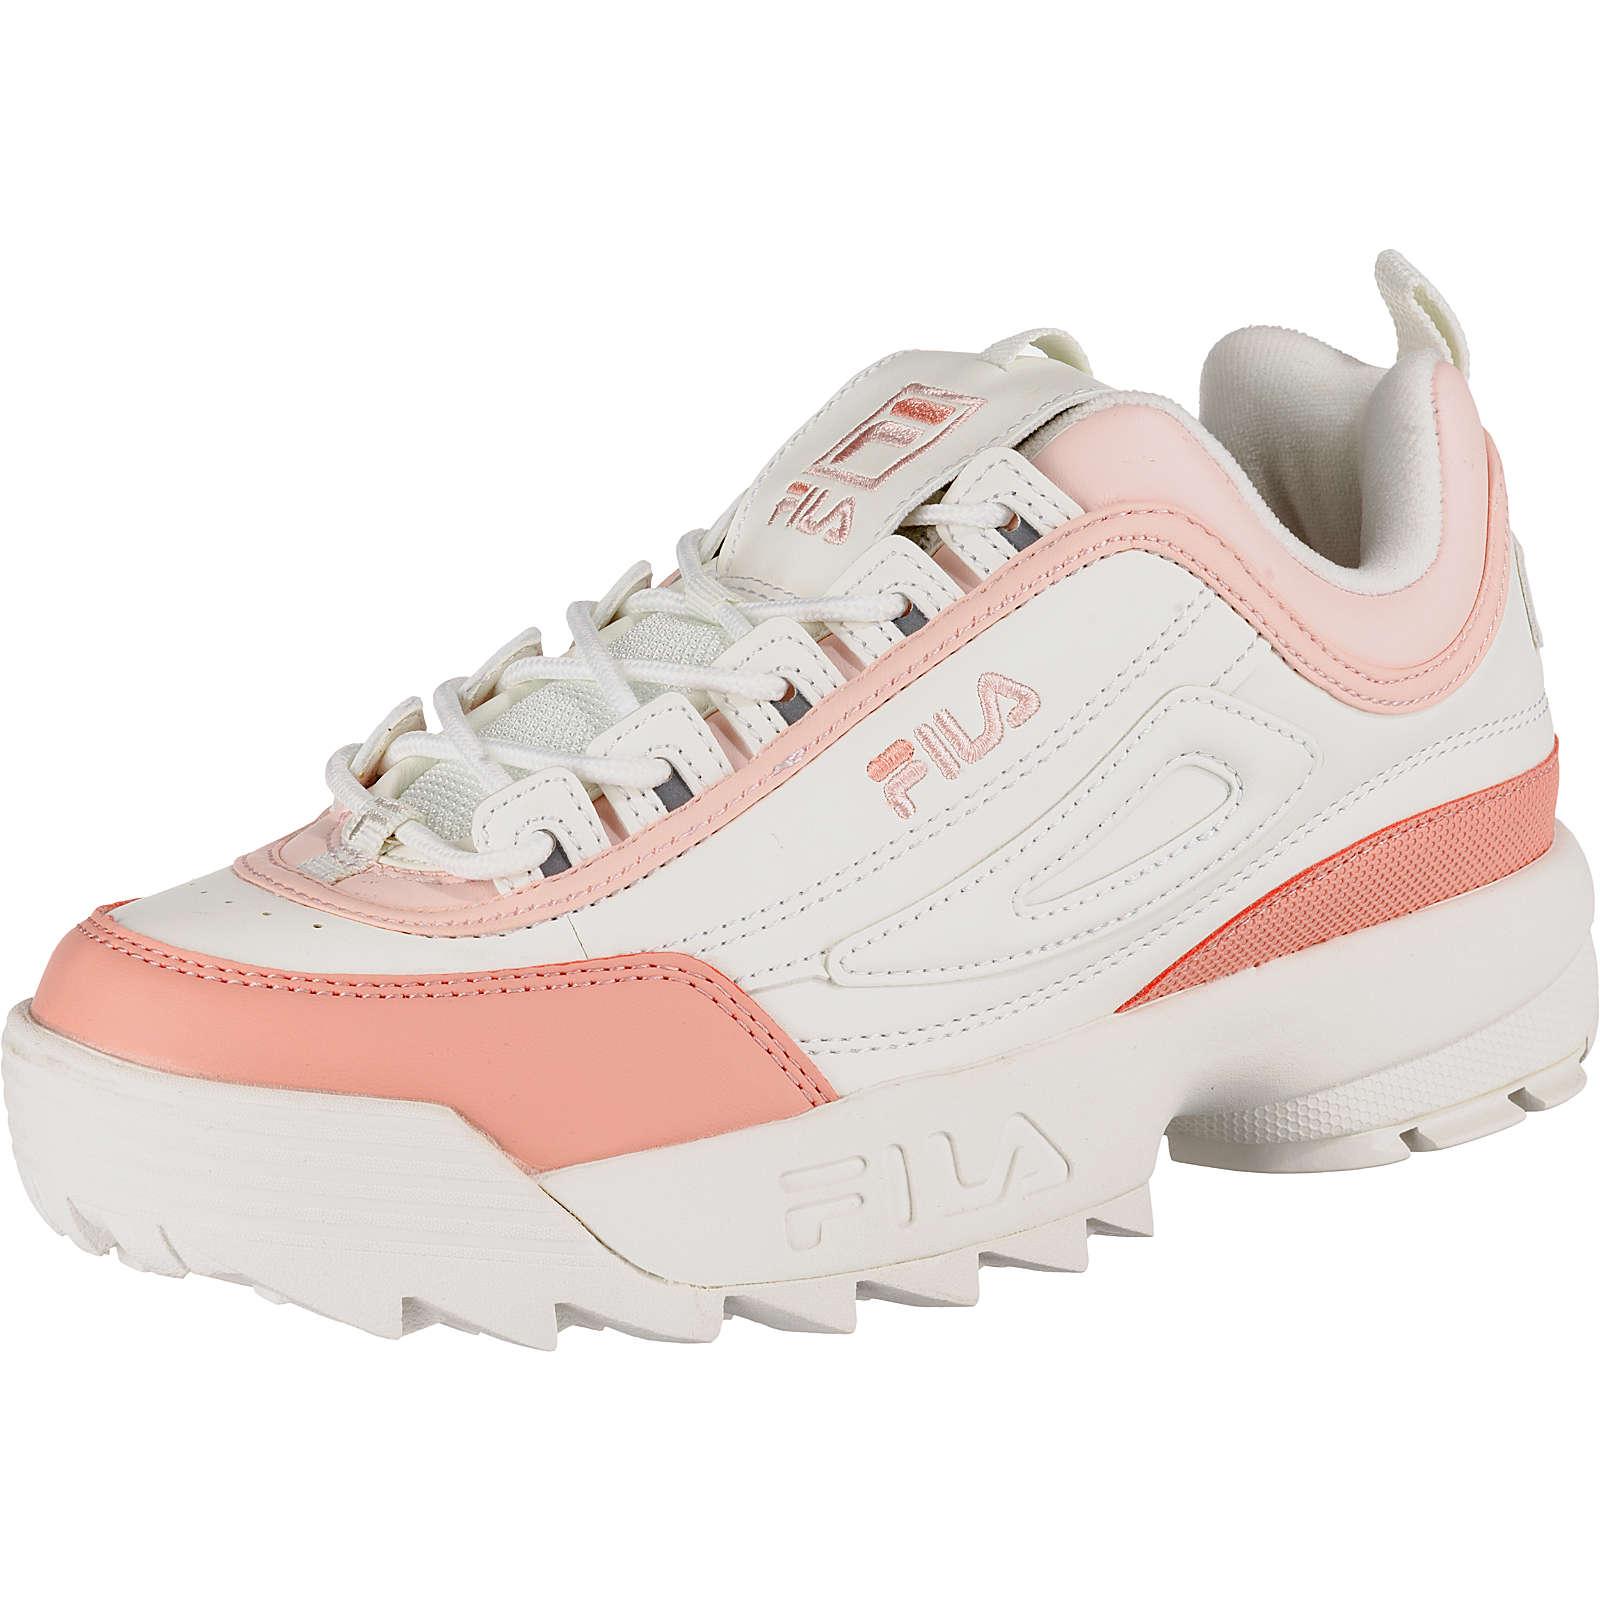 FILA Disruptor CB Sneakers Low creme Damen Gr. 37